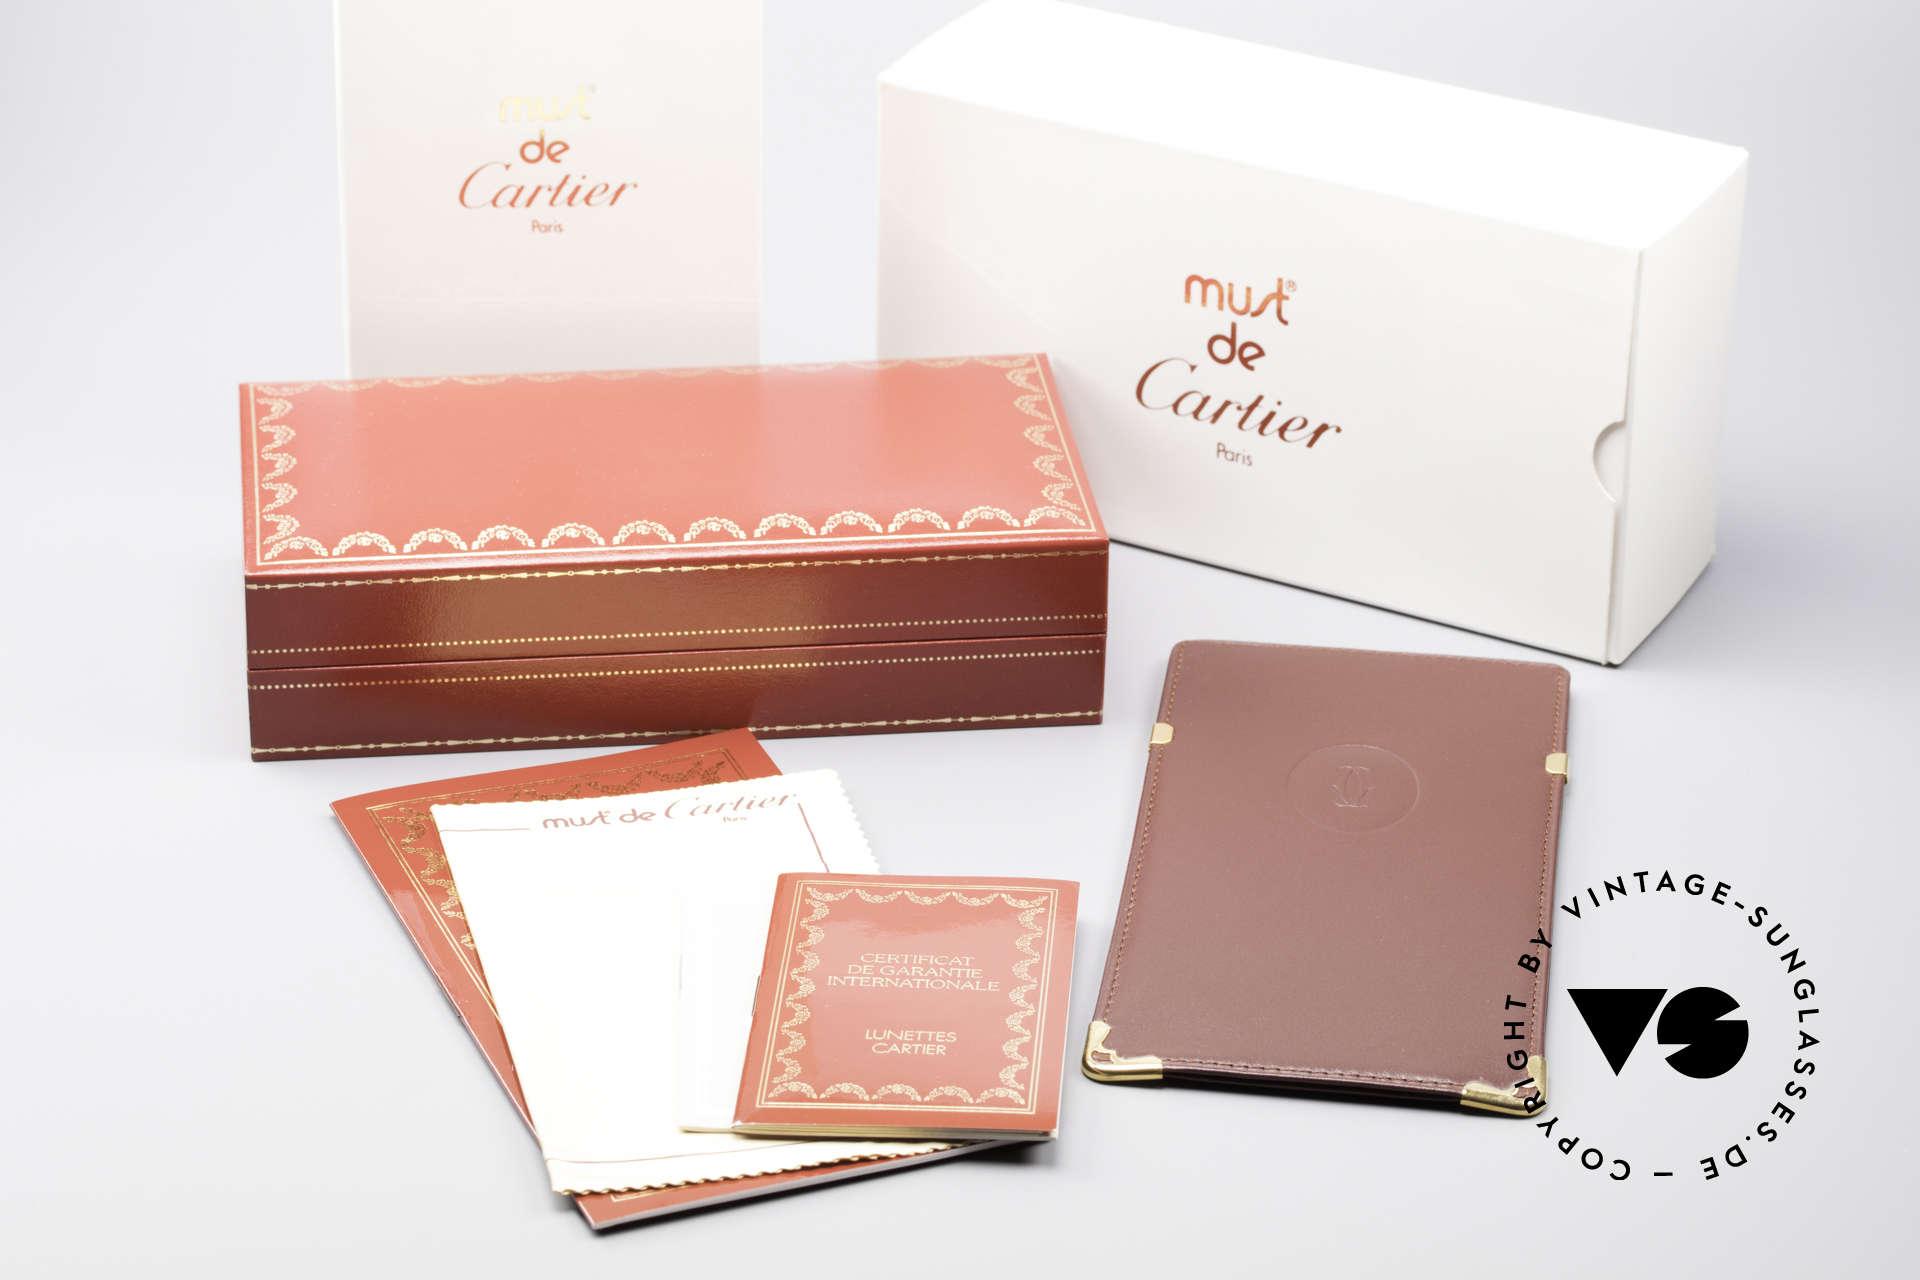 Cartier Vendome LC - M TRIPLE GRADIENT DESERT SUN, Size: medium, Made for Men and Women